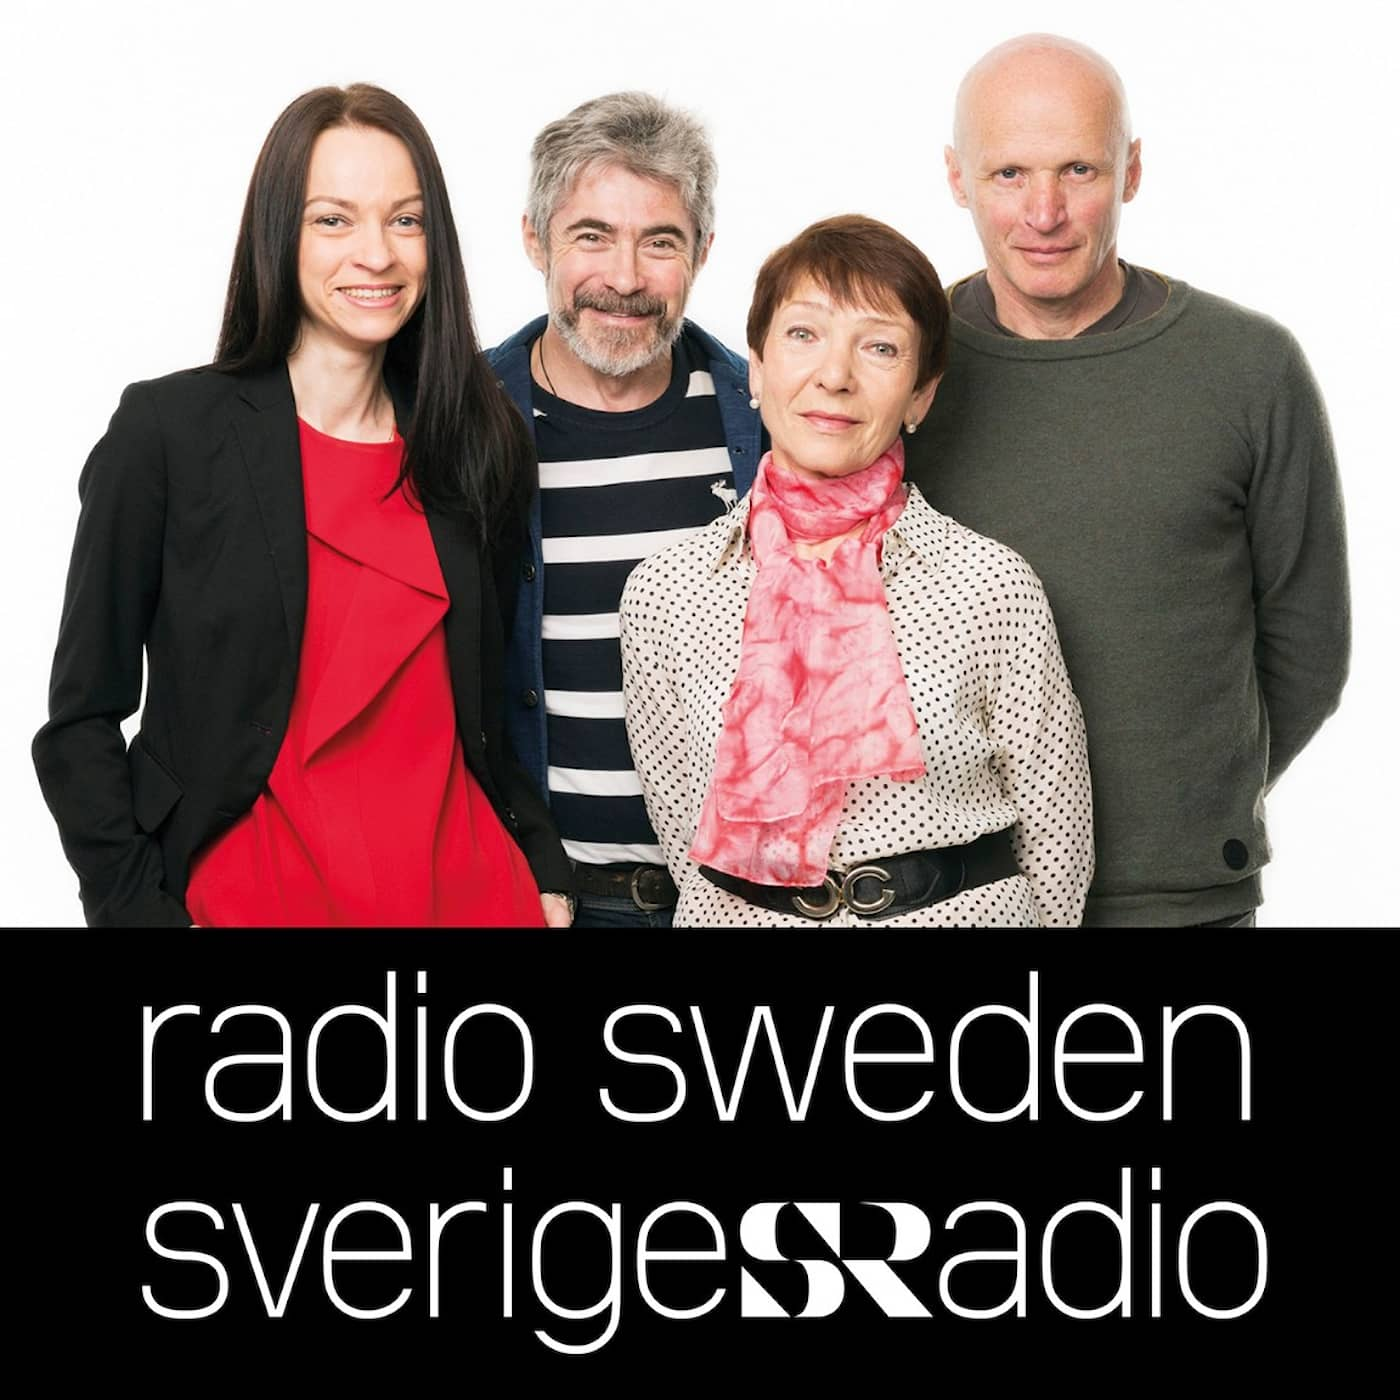 Радио Швеция